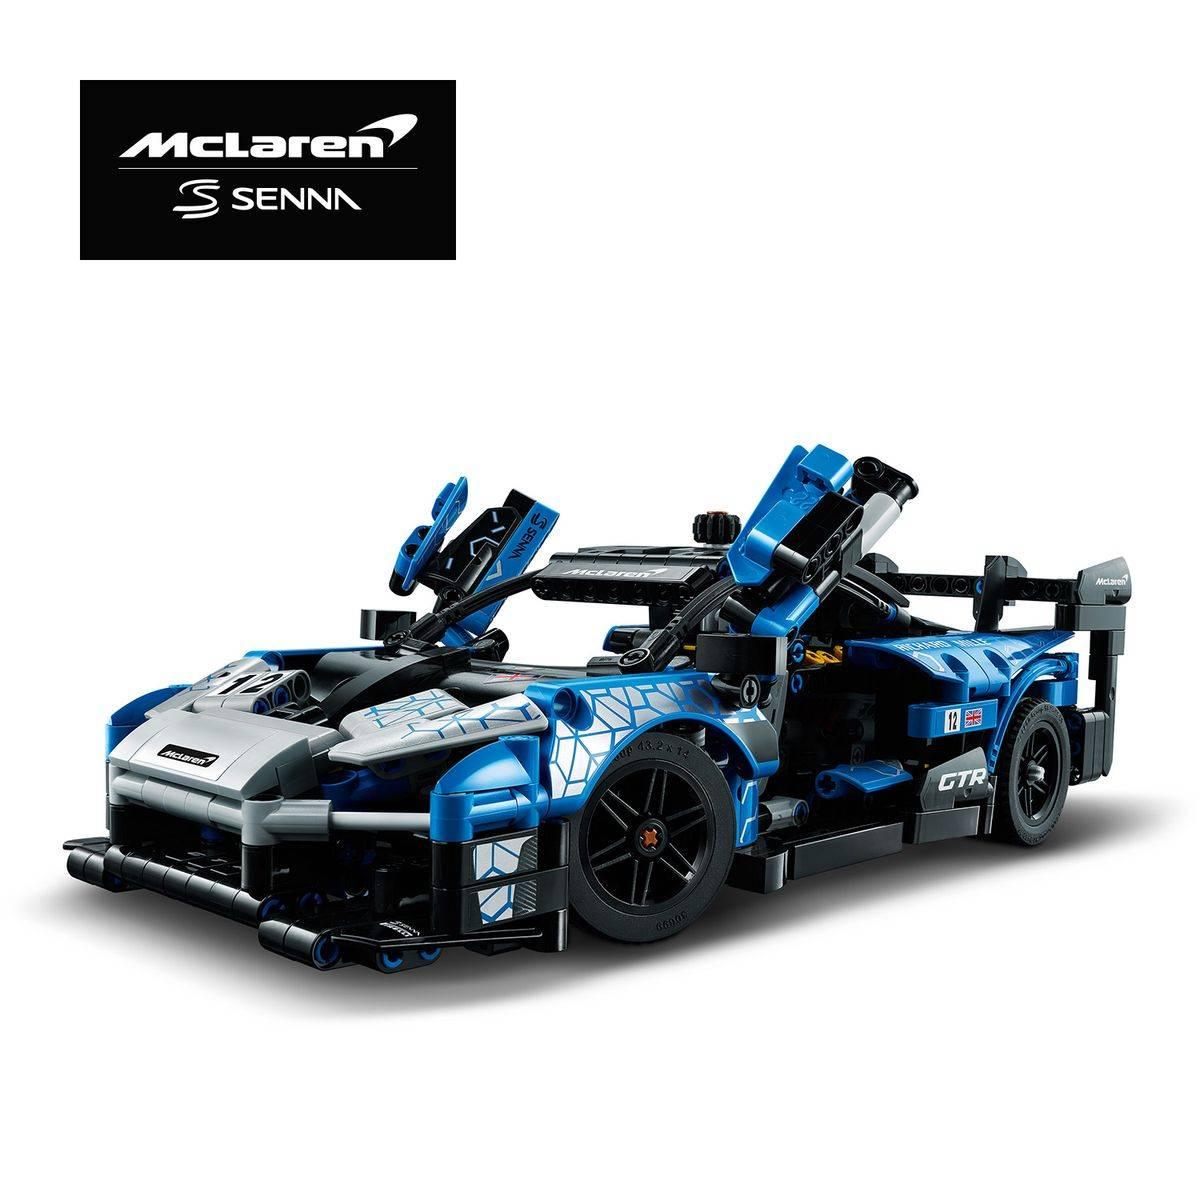 LEGO Technic McLaren Senna GTR model 42123